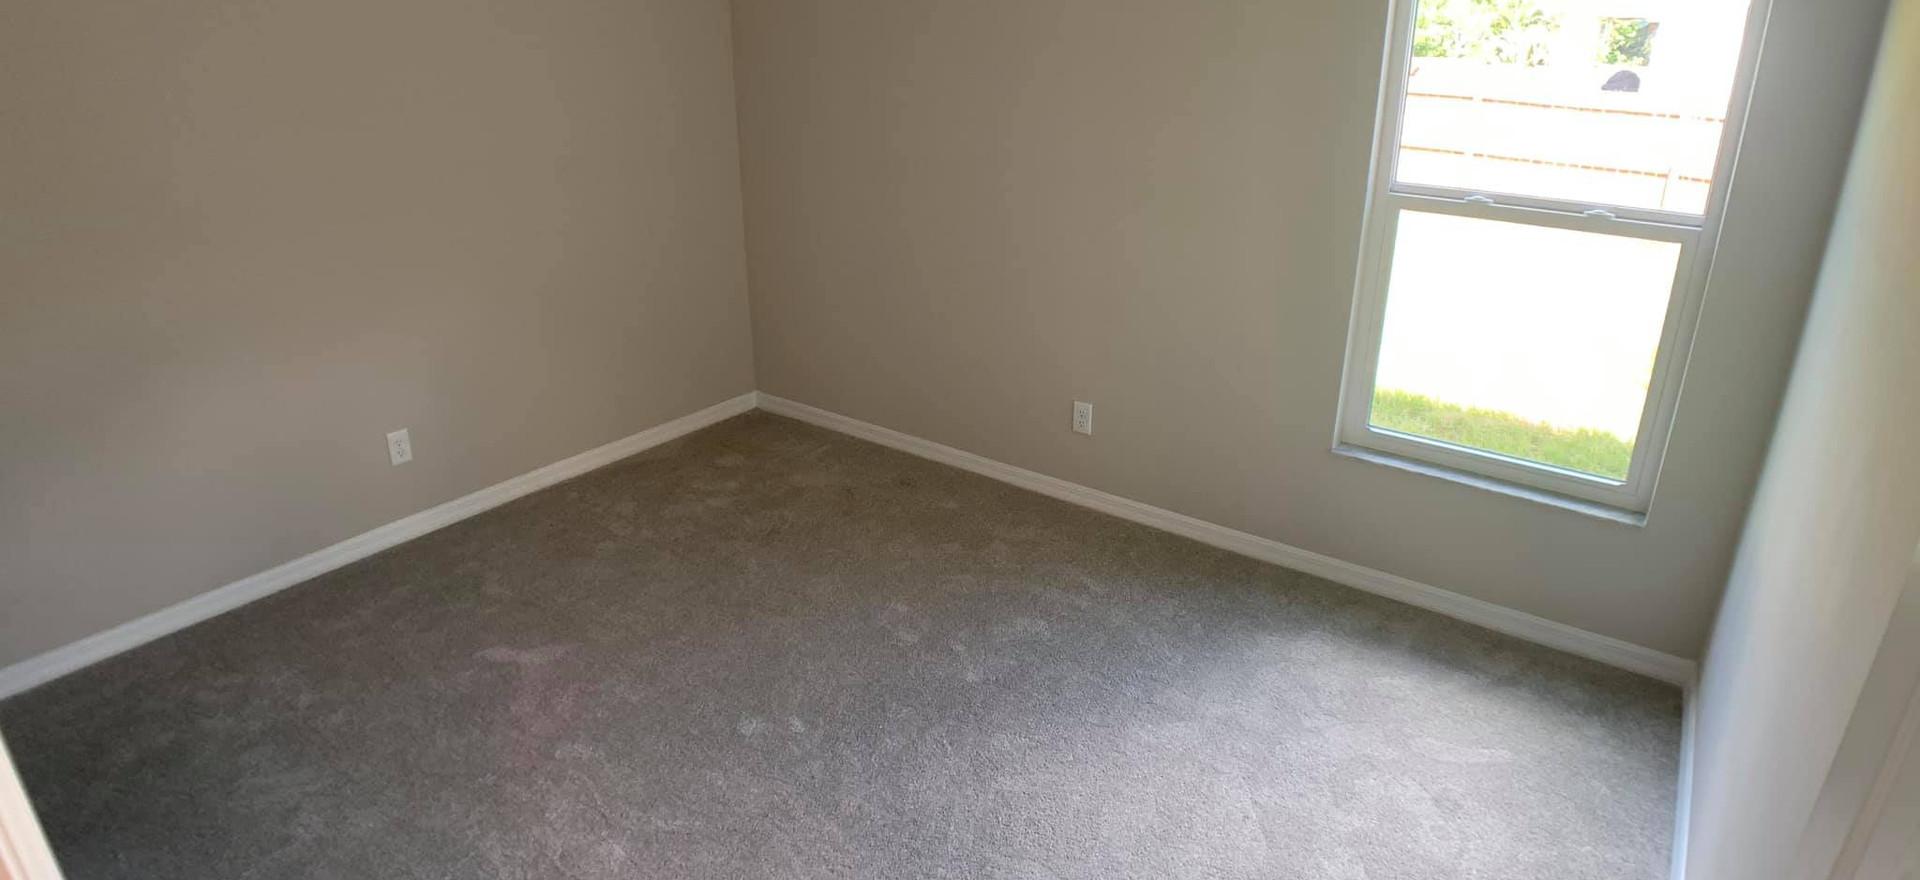 Camelot Floorplan, Groza Builders Inc